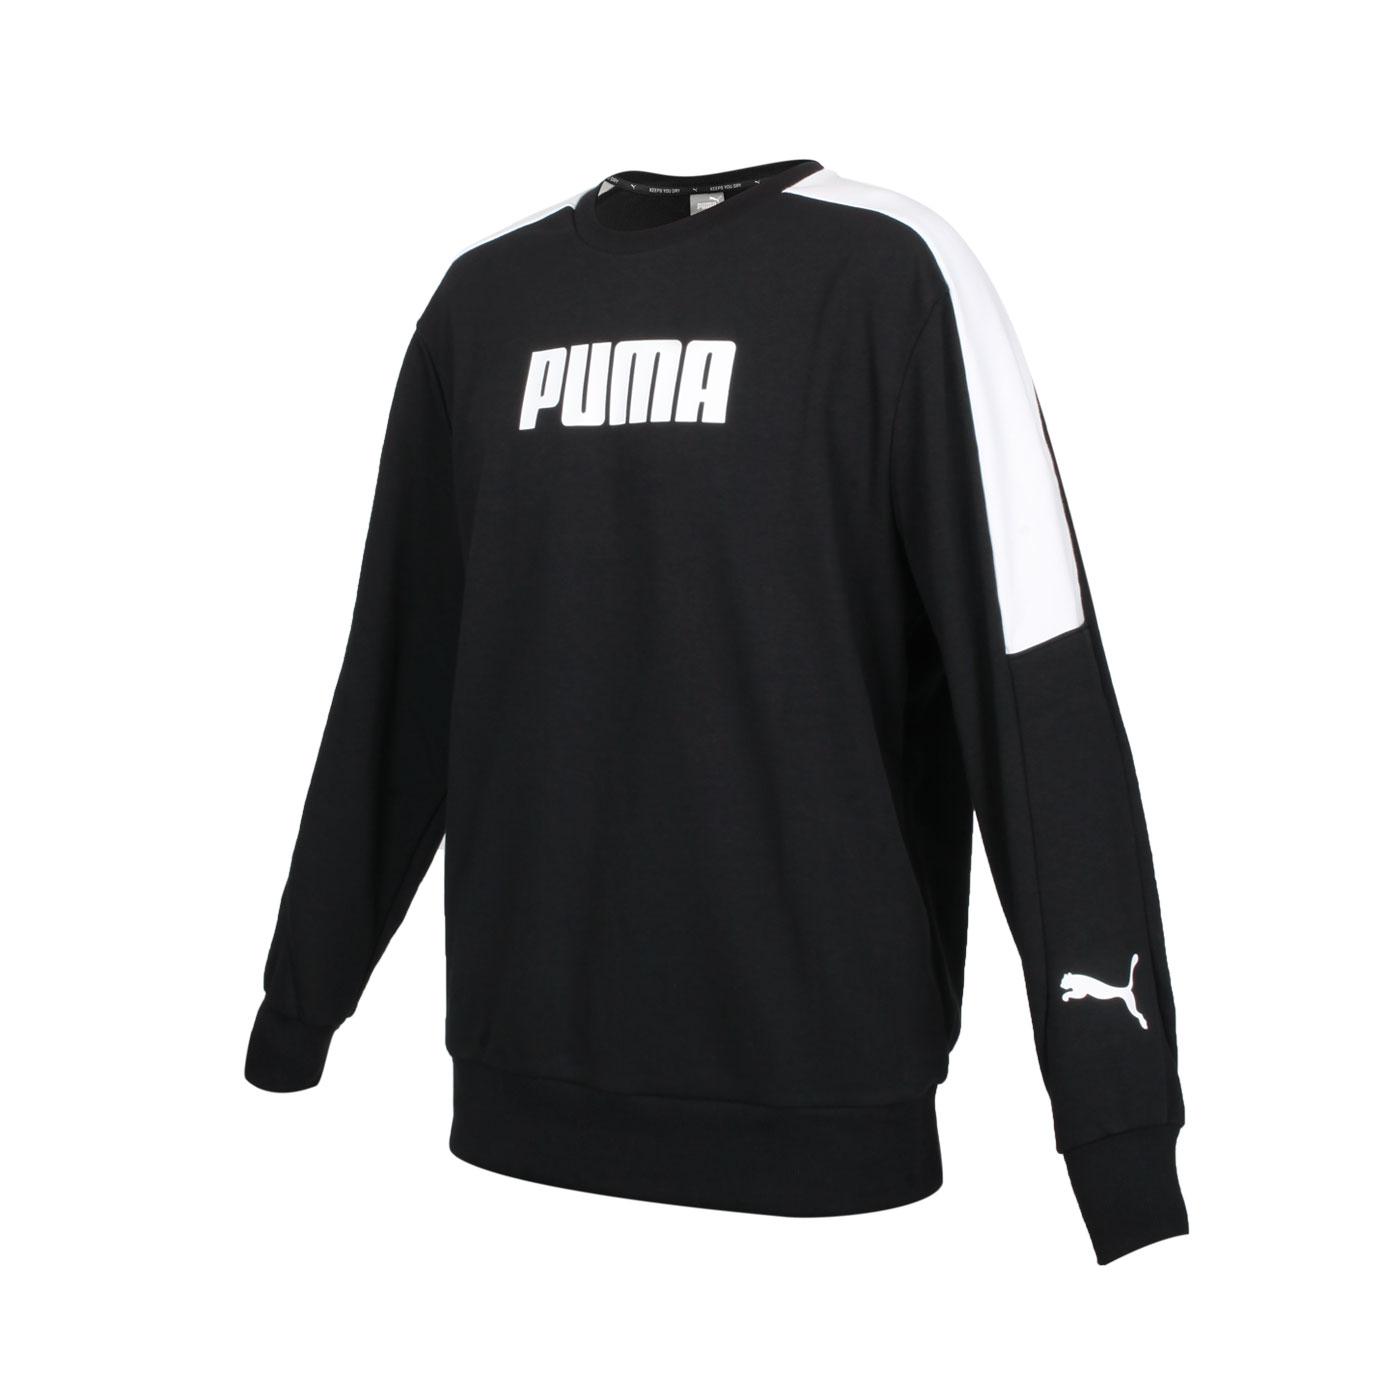 PUMA 男款基本系列Modren Sports長袖圓領T恤 58947401 - 黑白